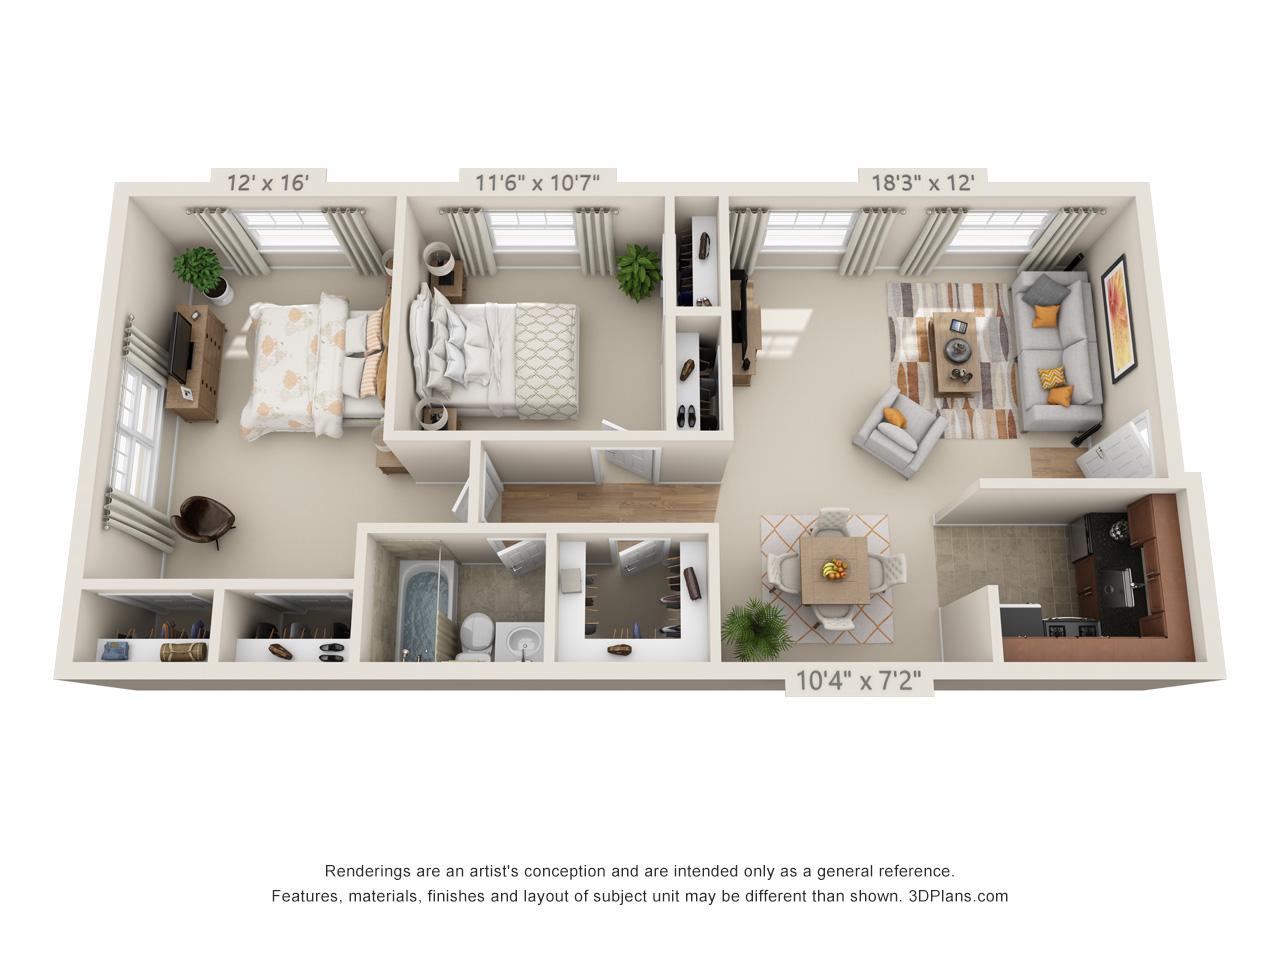 2 bedroom hatboro apartments